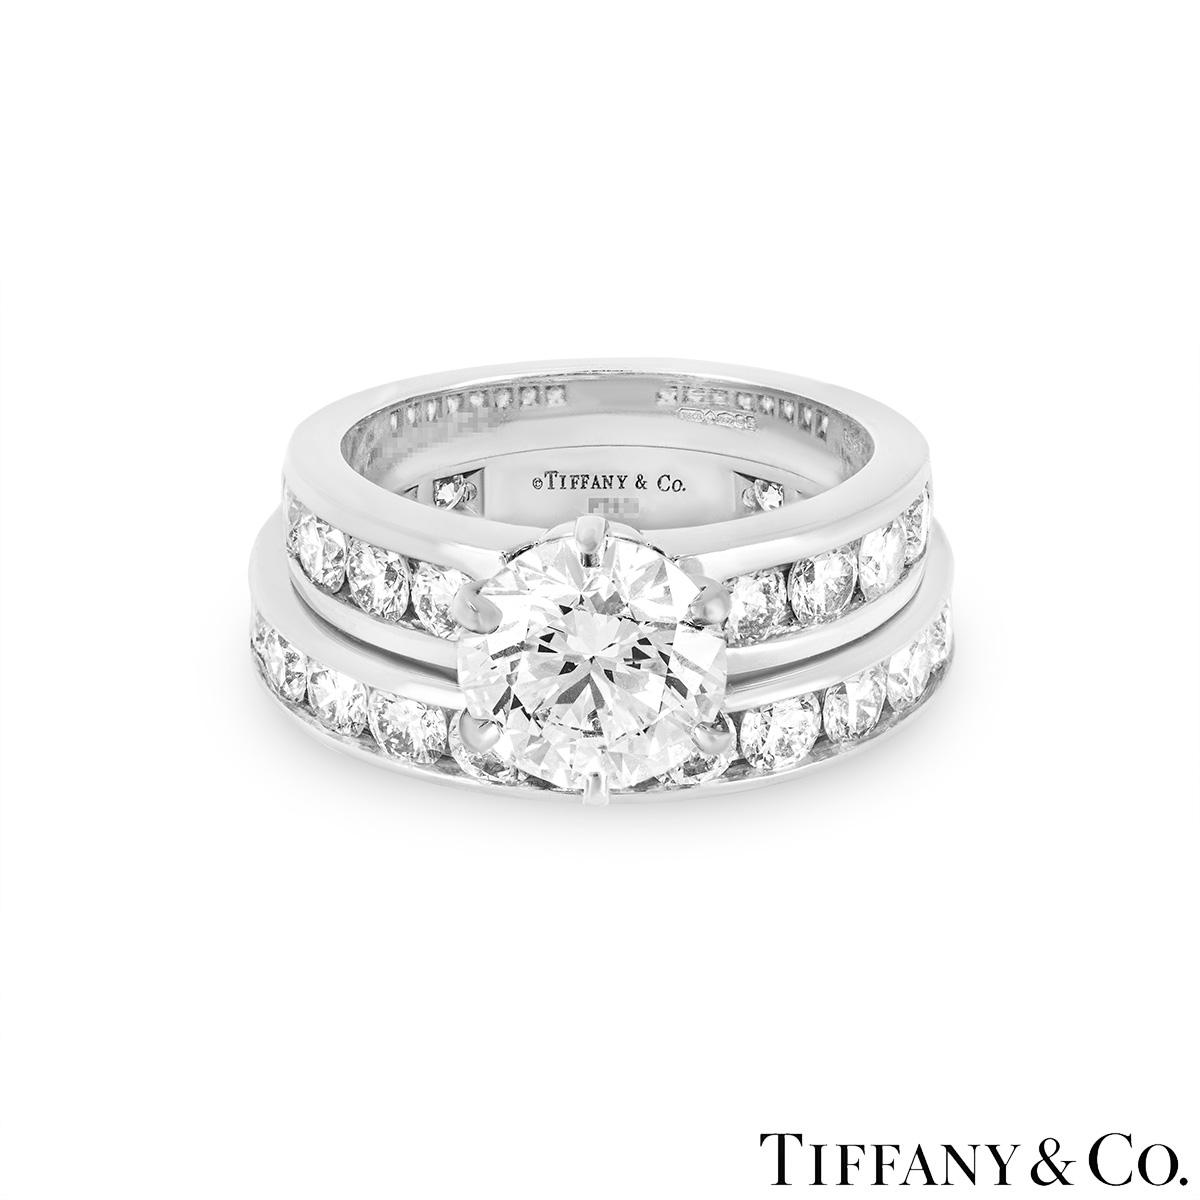 Tiffany & Co. Platinum Diamond Ring 2.04ct F/VS1 XXX with Diamond Full Eternity Ring